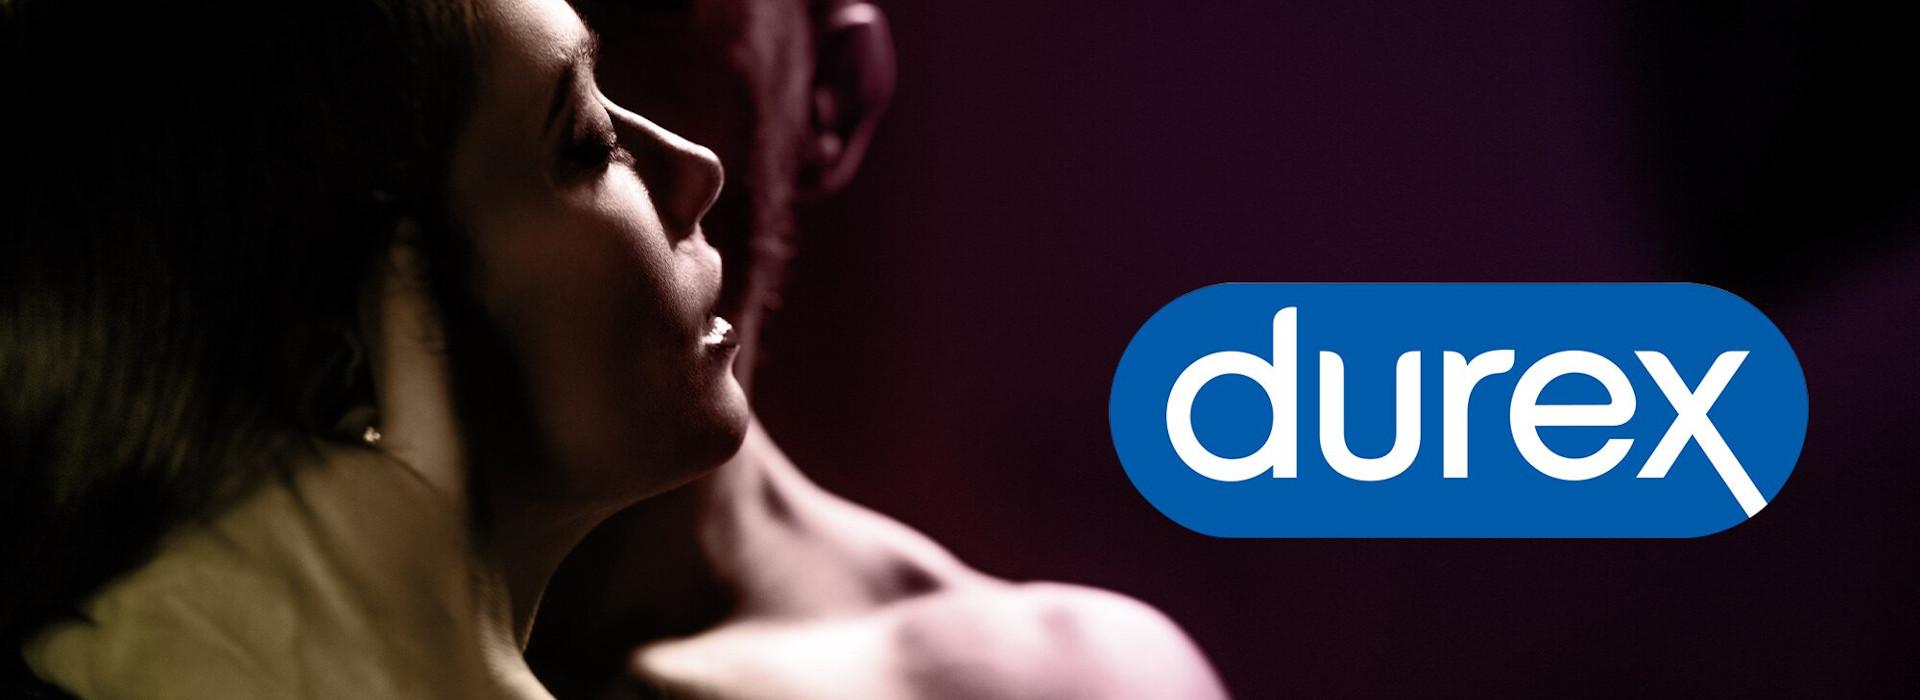 Durex - lubrikační gely, kondomy, ...